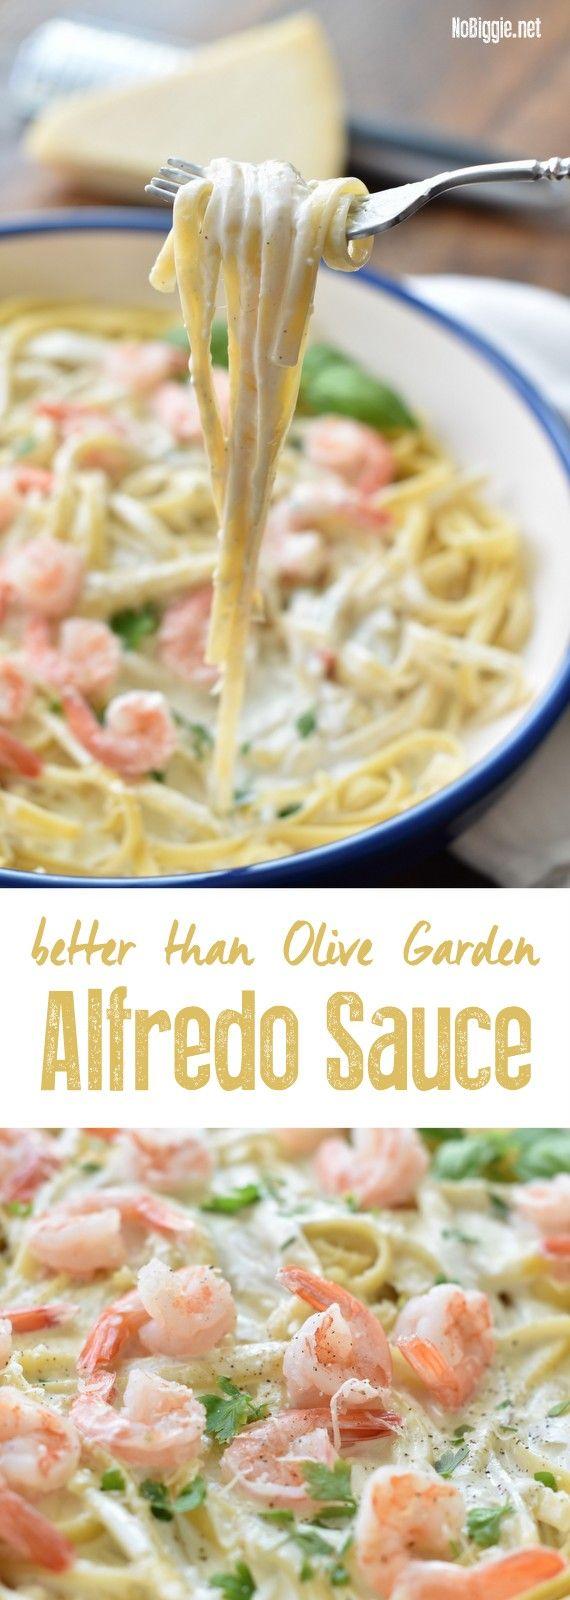 499 best nobiggie recipes images on pinterest kitchens - Better than olive garden alfredo sauce ...